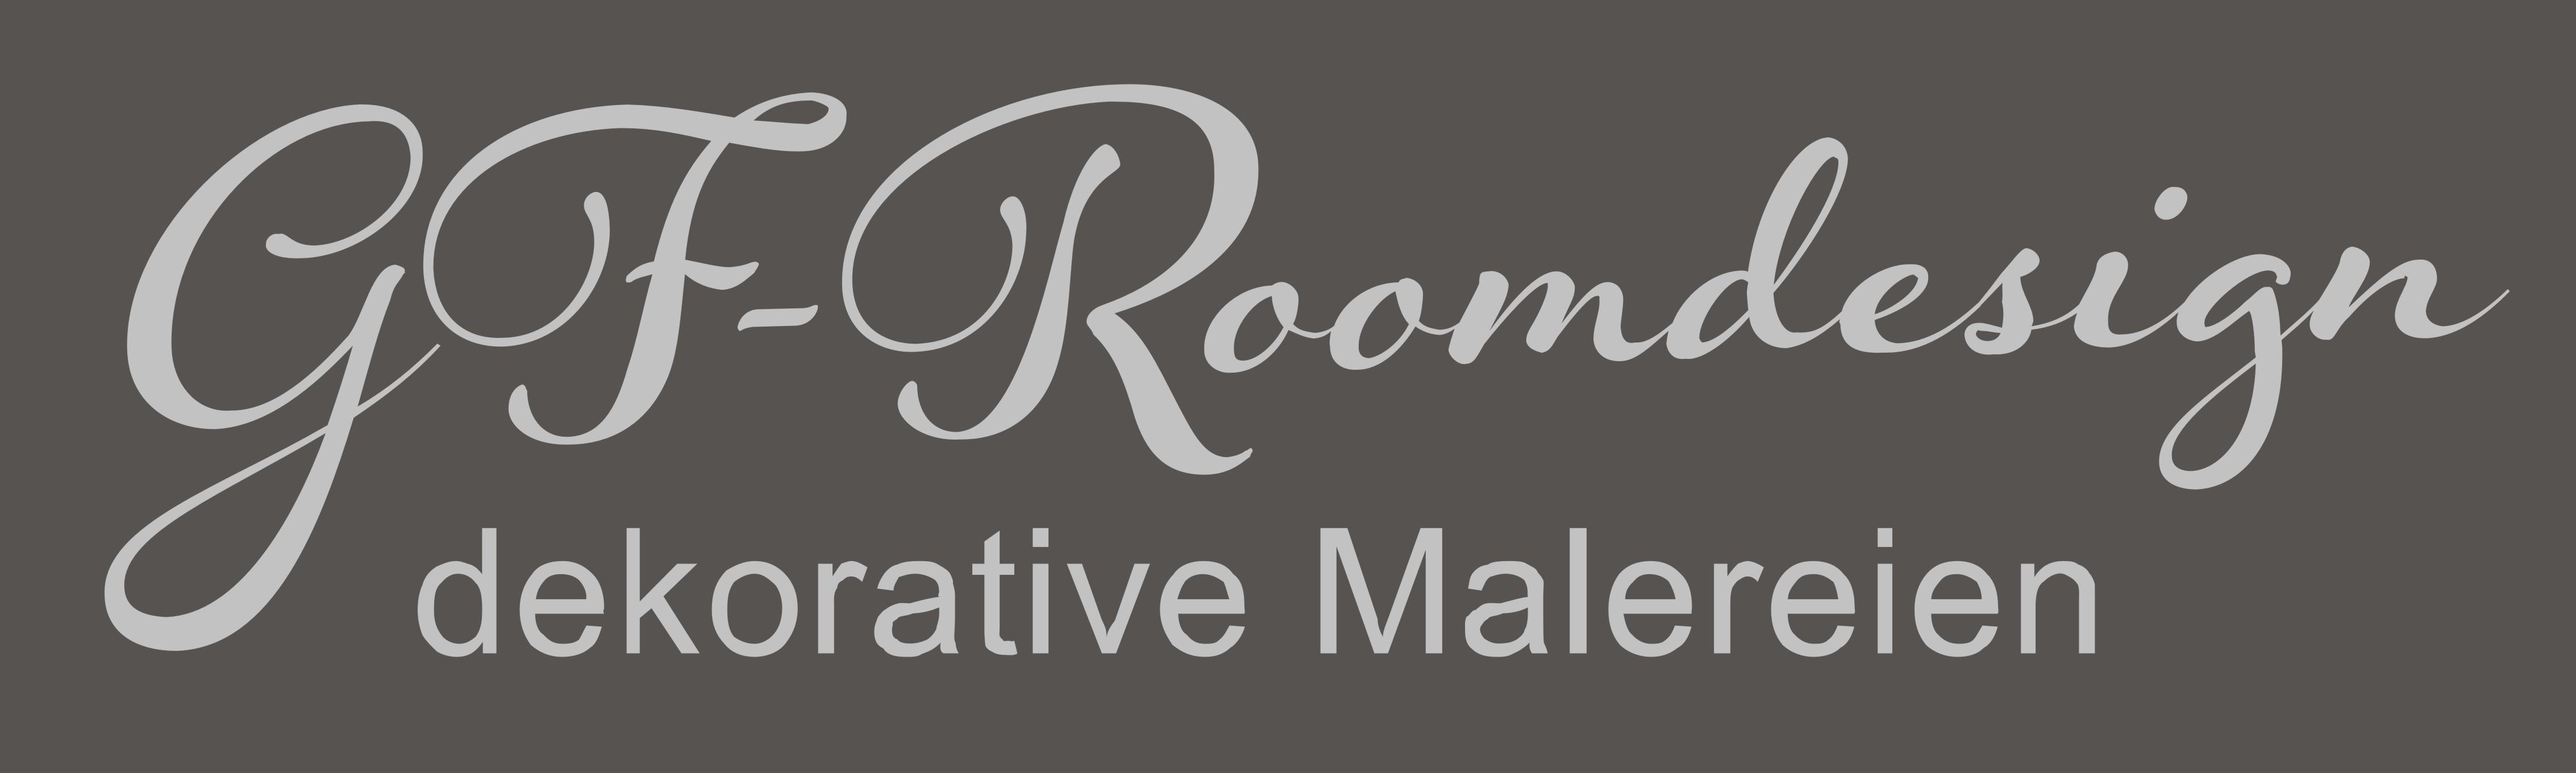 gf Room